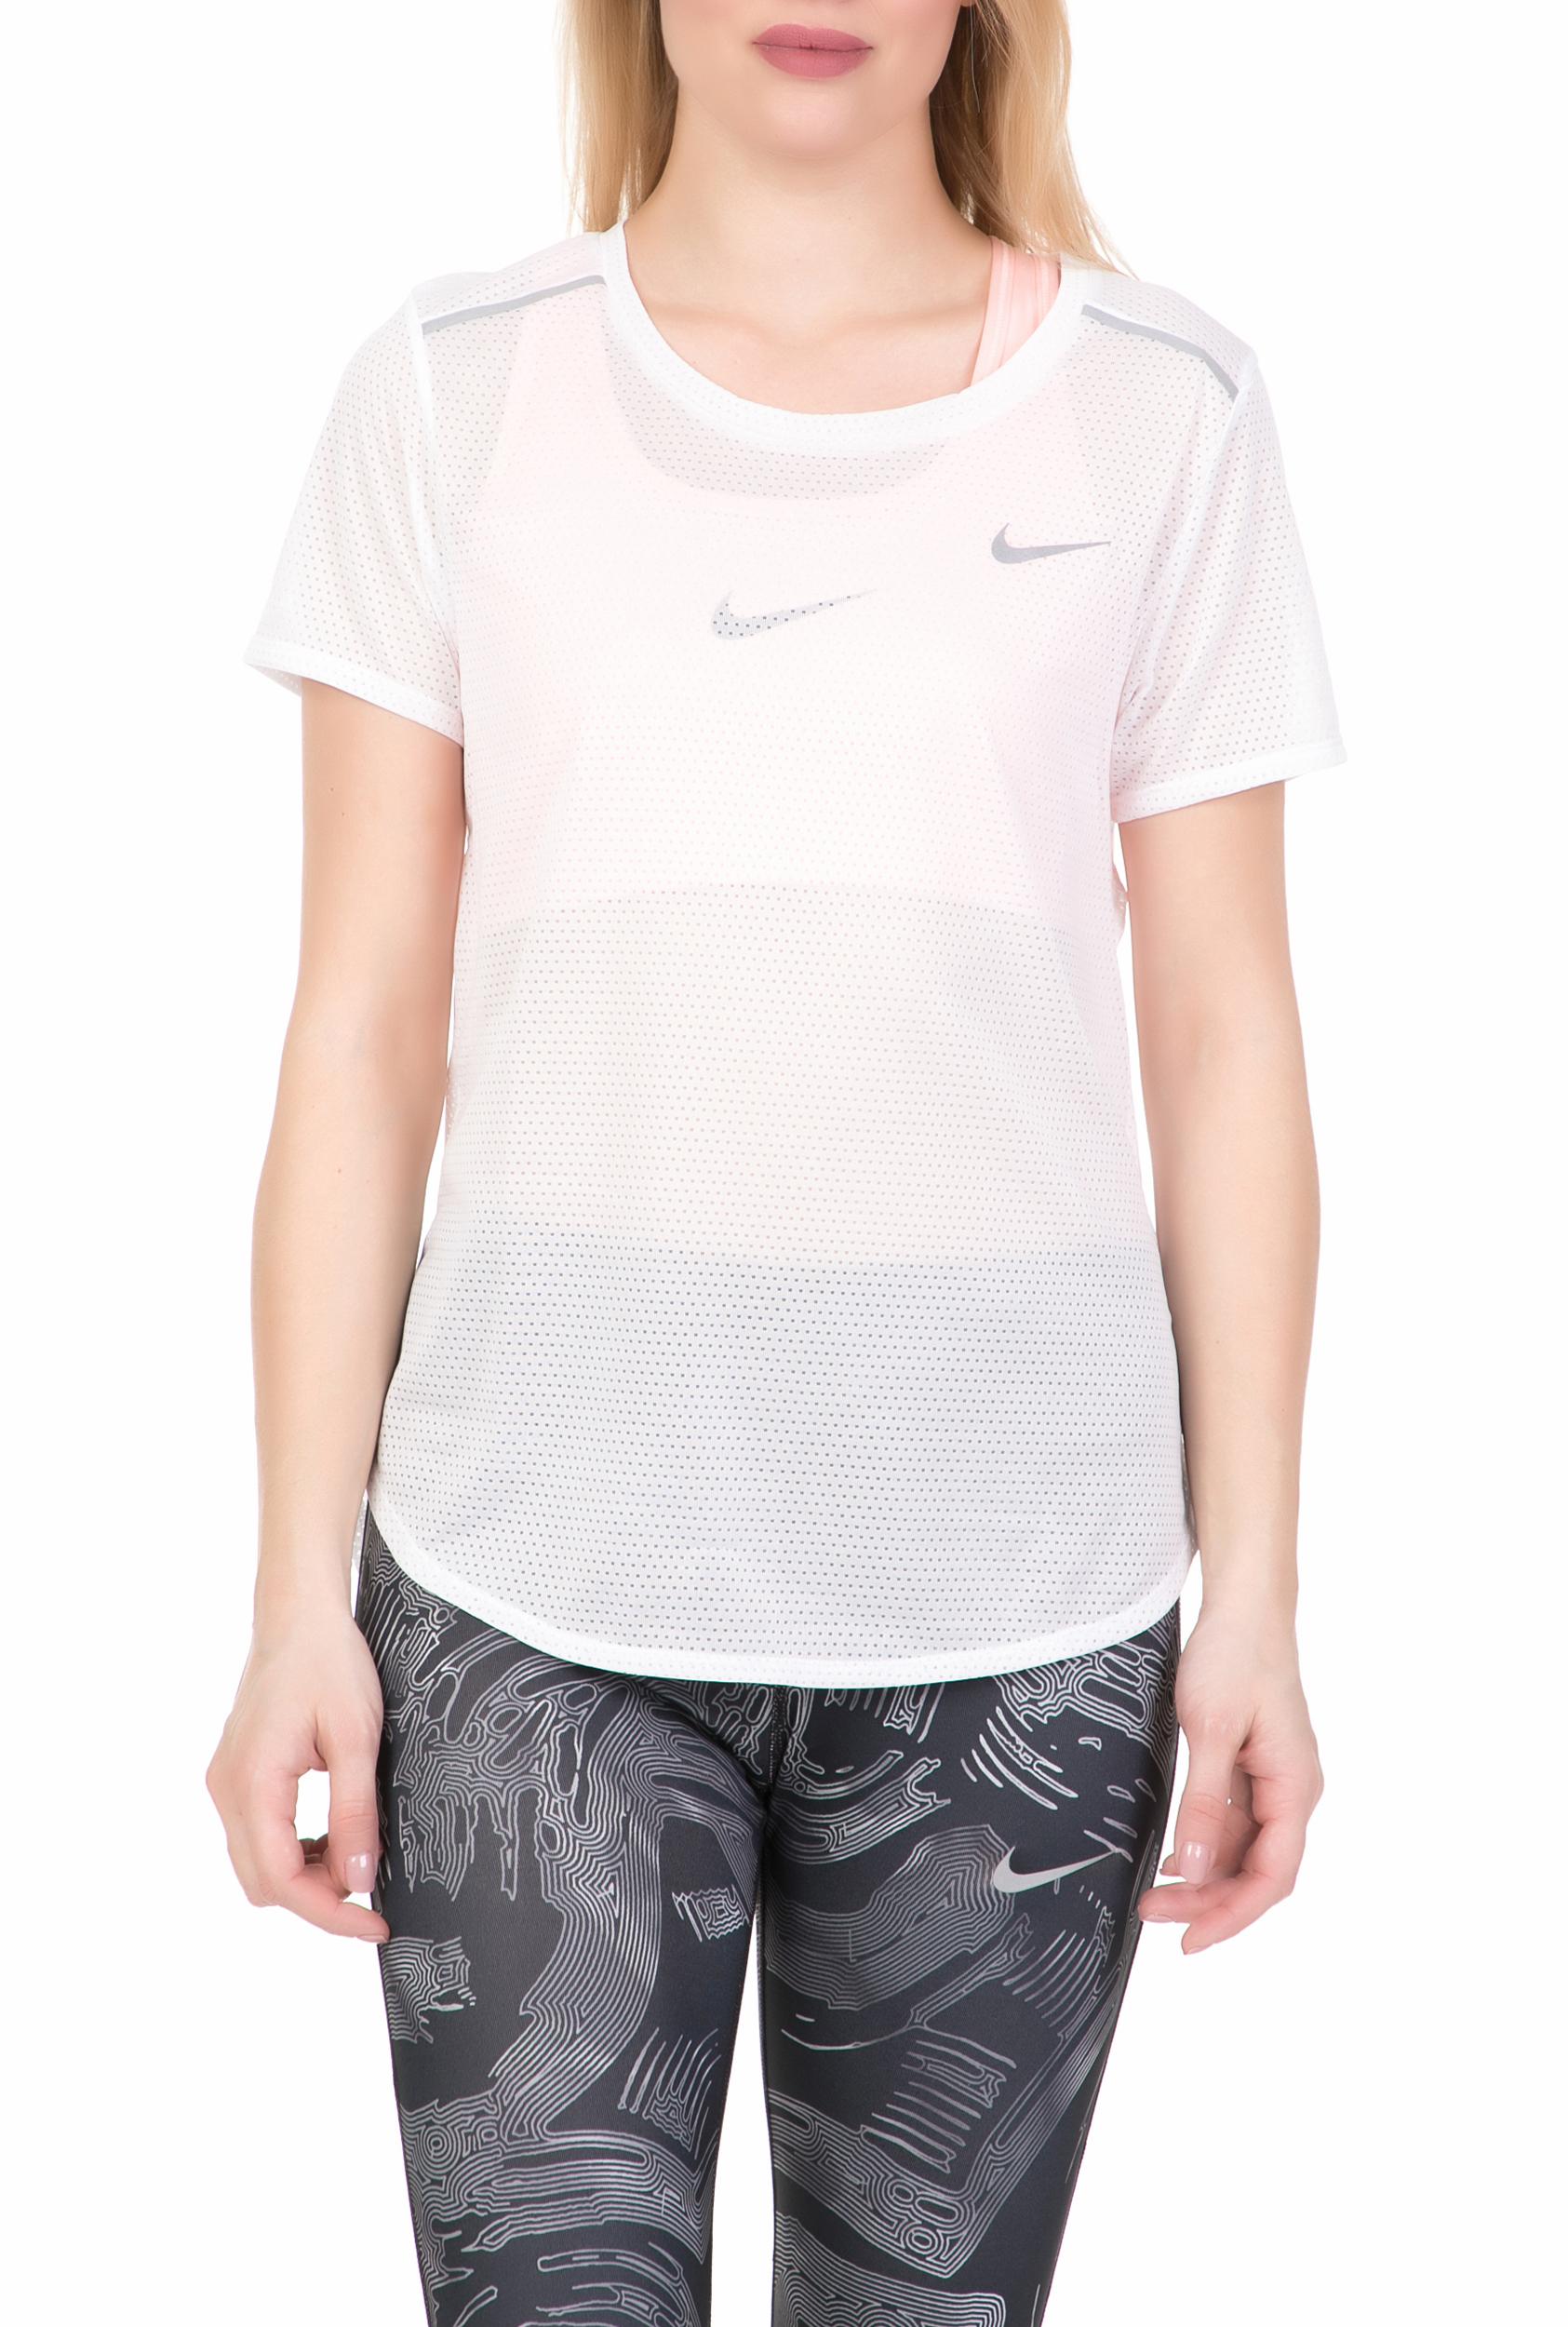 NIKE - Γυναικείο αθλητικό t-shirt NIKE BRTHE λευκό